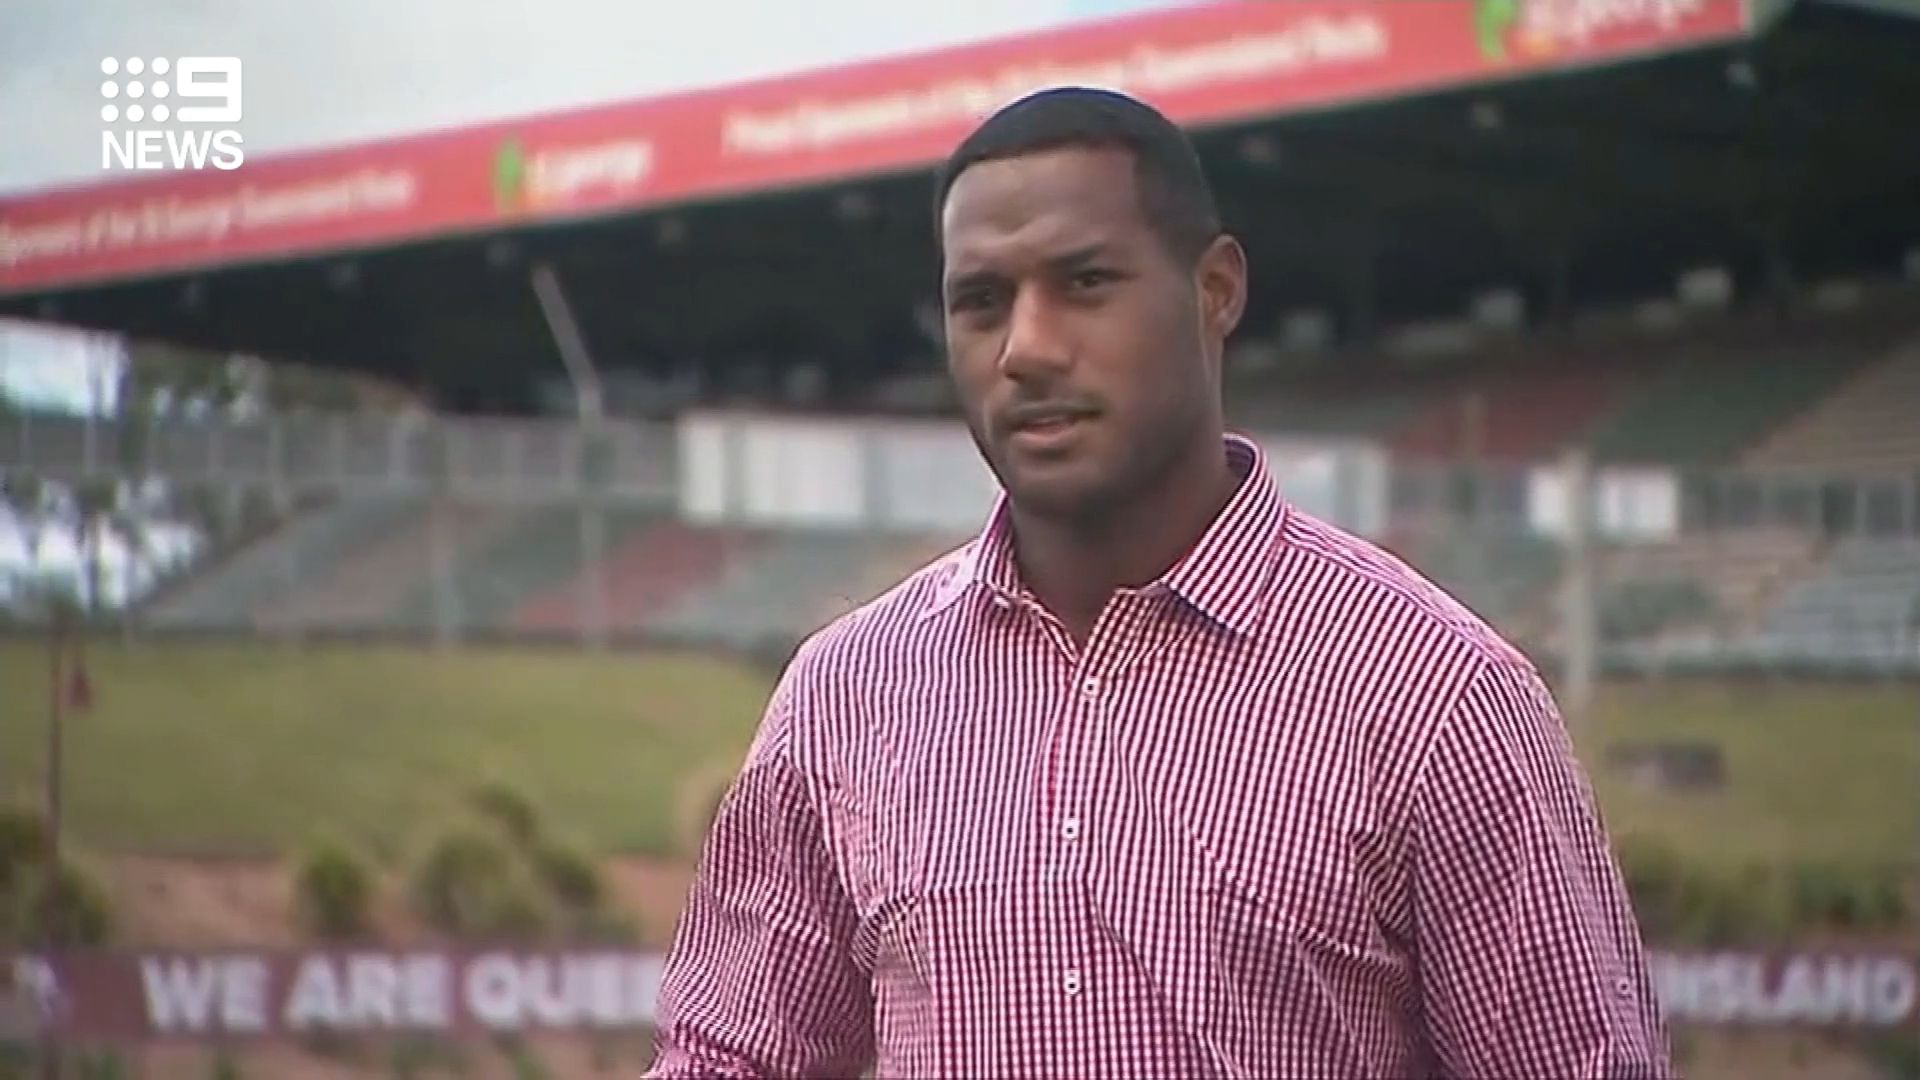 EXCLUSIVE: Suliasi Vunivalu set to make his Queensland Reds debut v Melbourne Rebels on Friday night